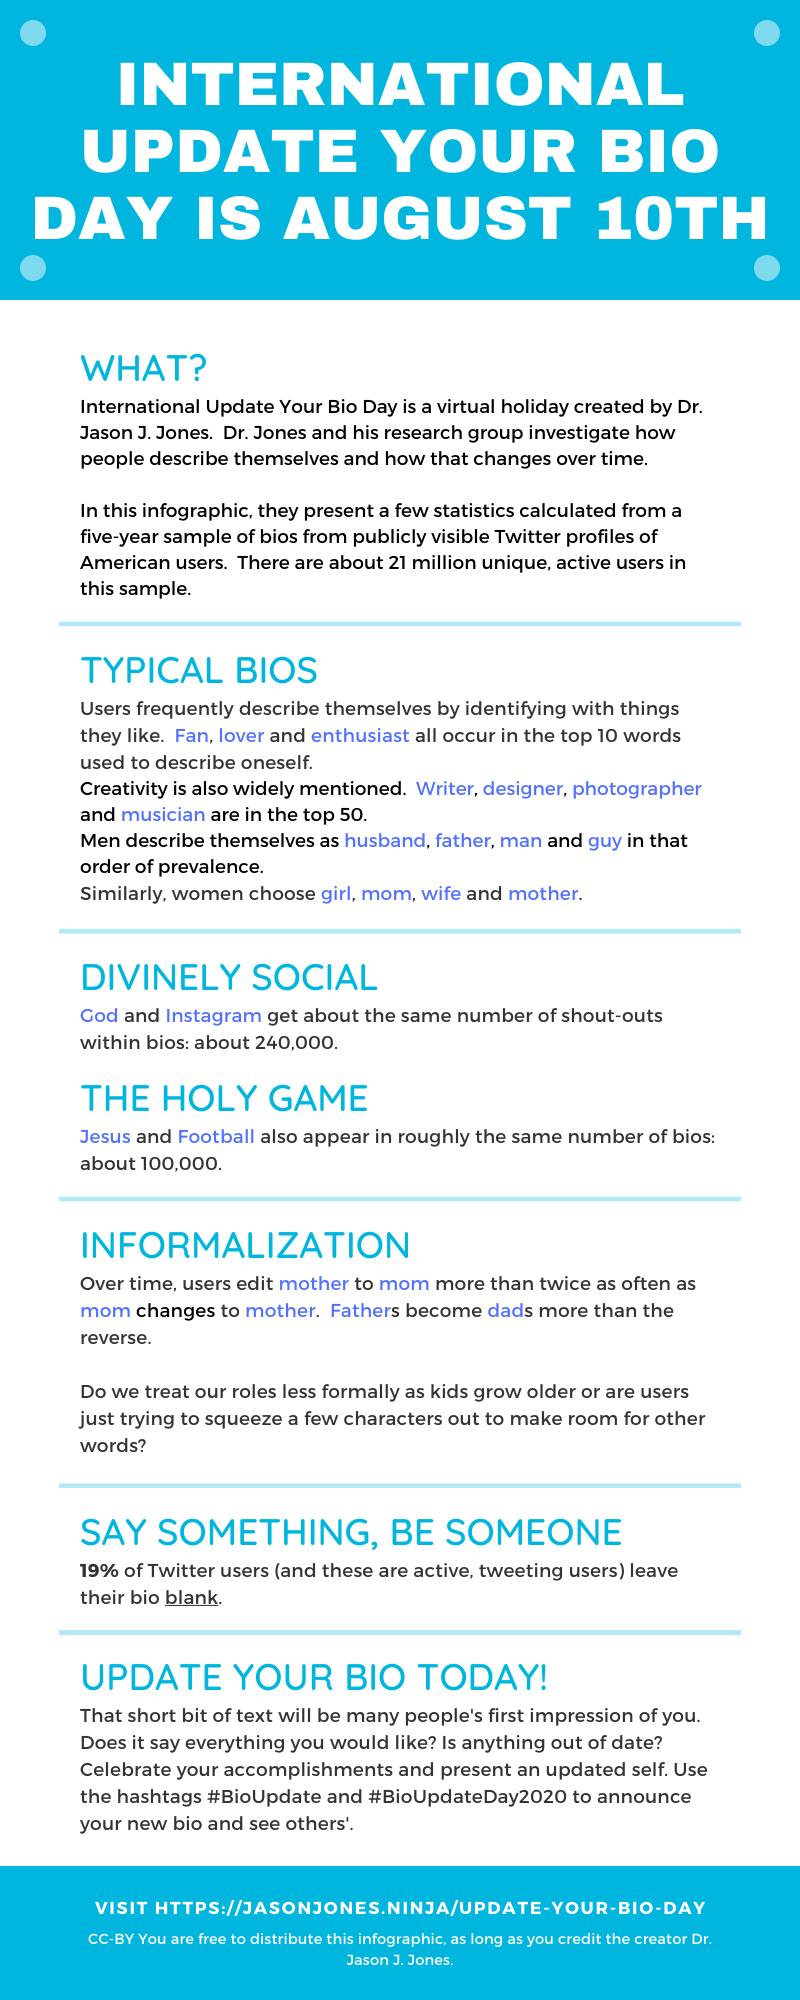 Update your bio infographic